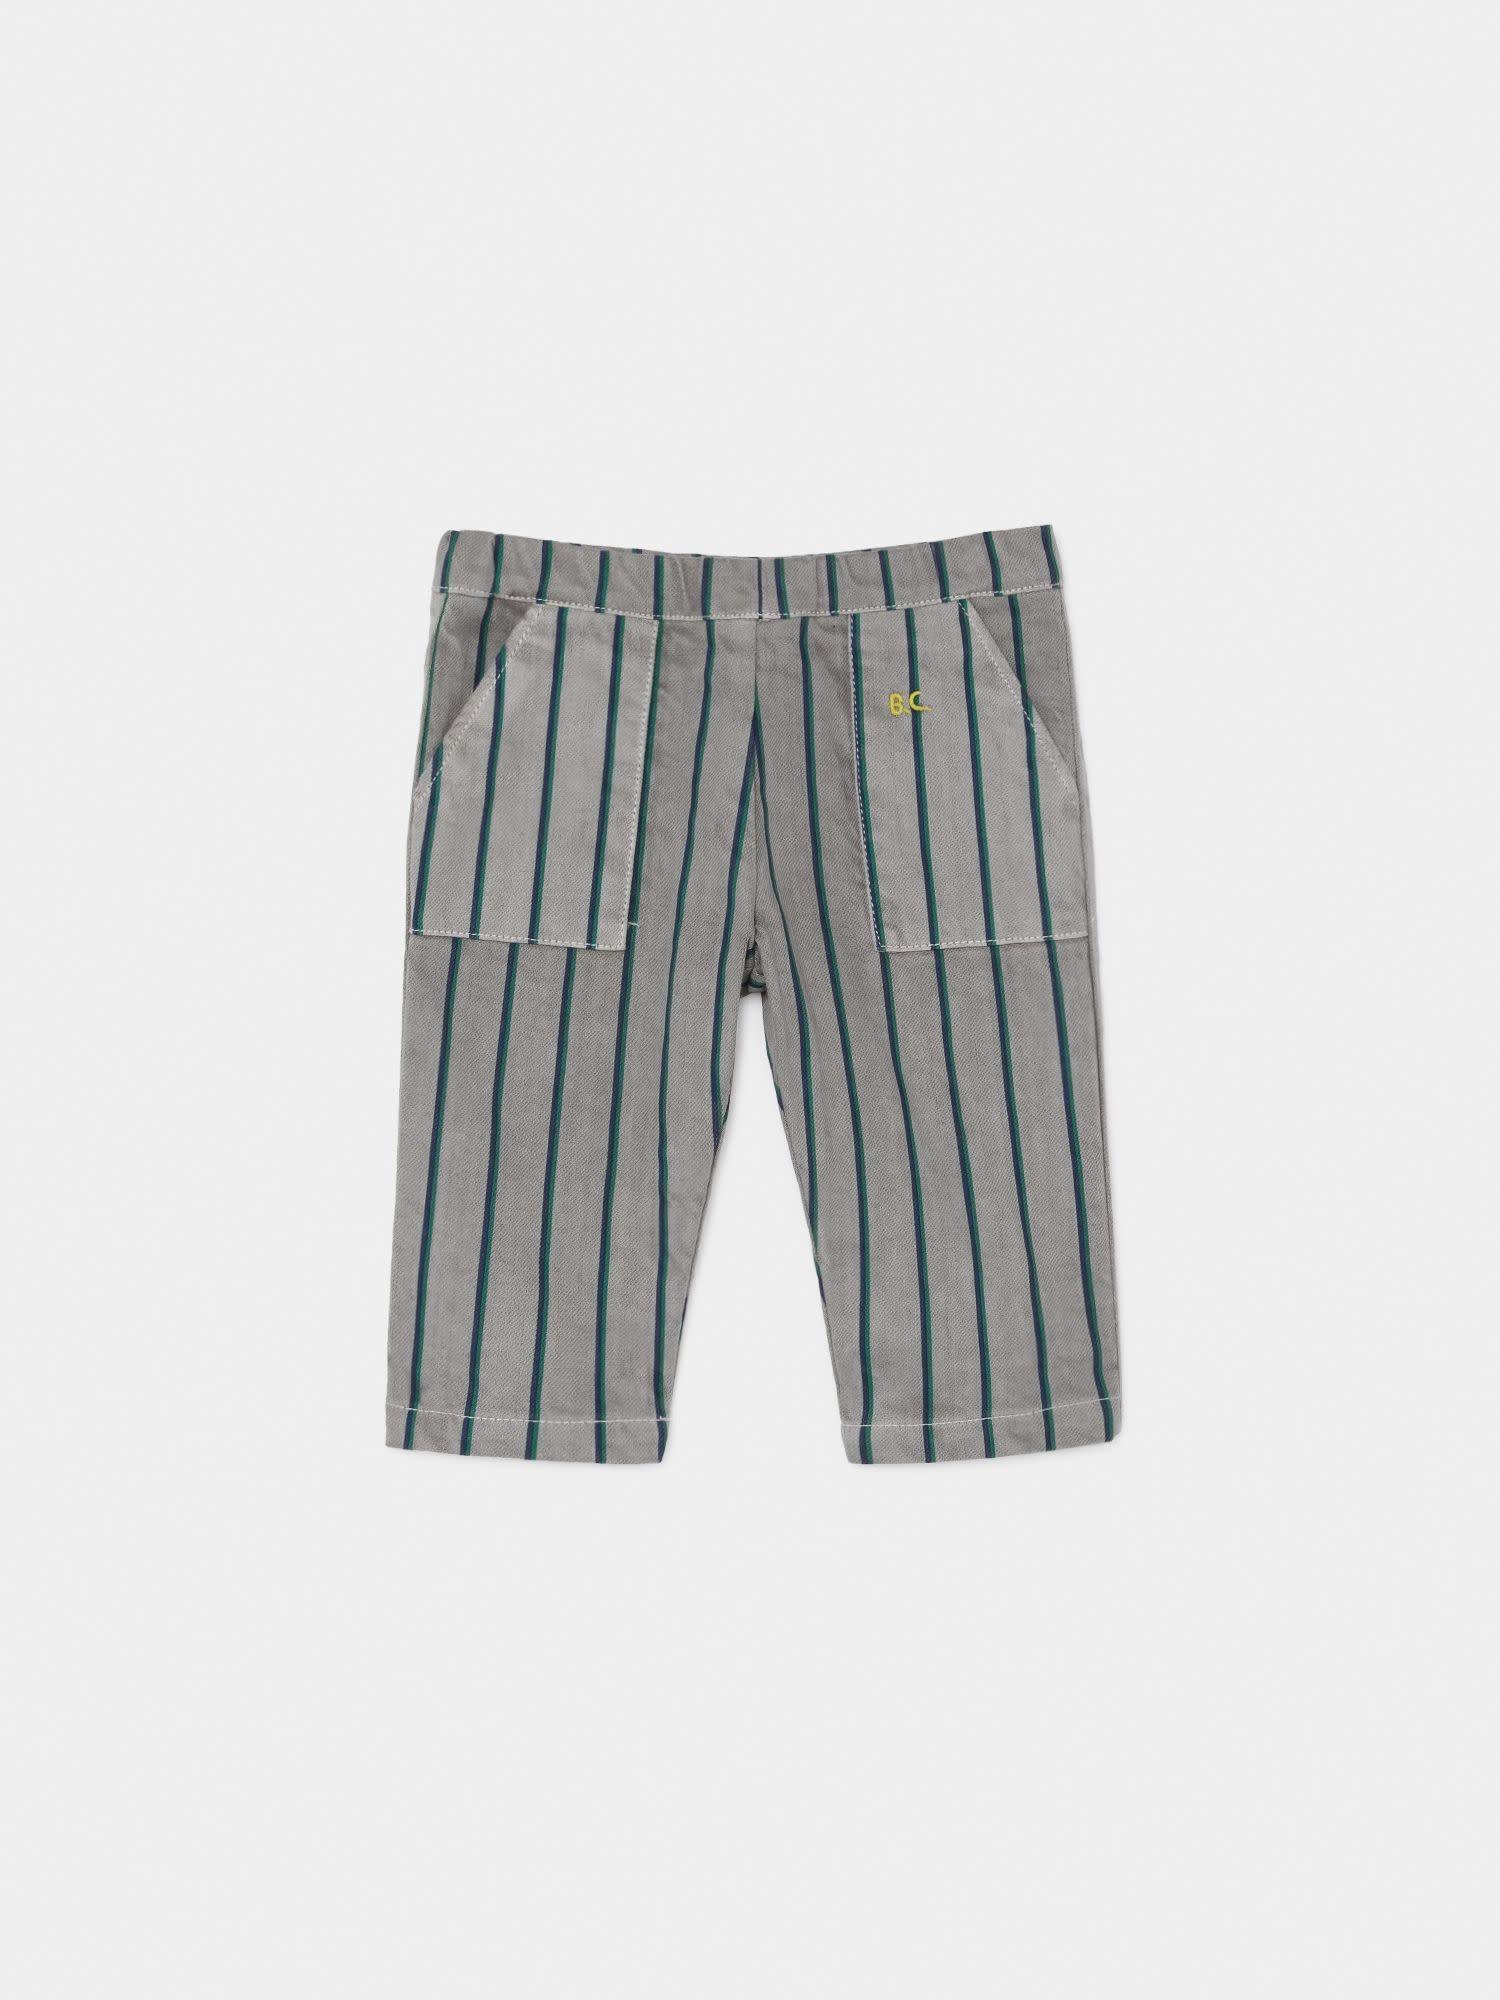 BOBO CHOSES Striped Straight Pants